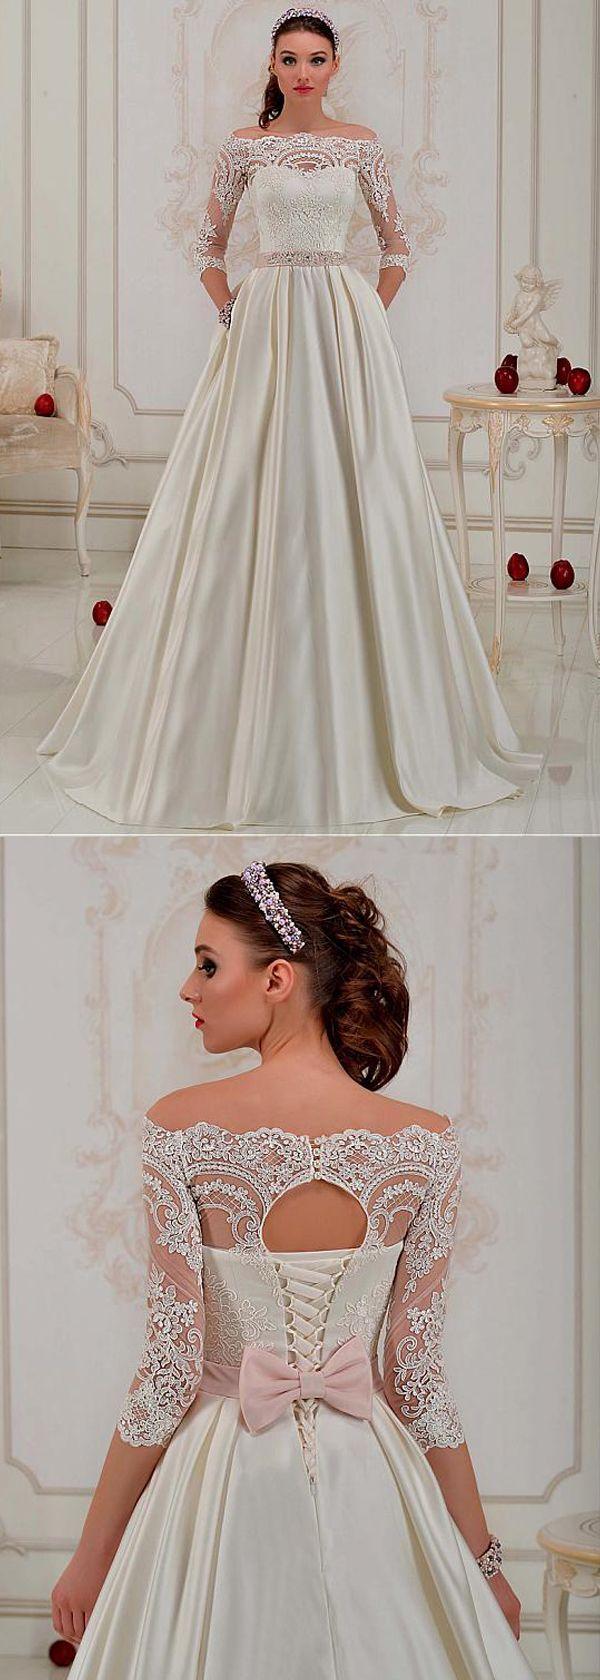 Wedding-Dresses-0941